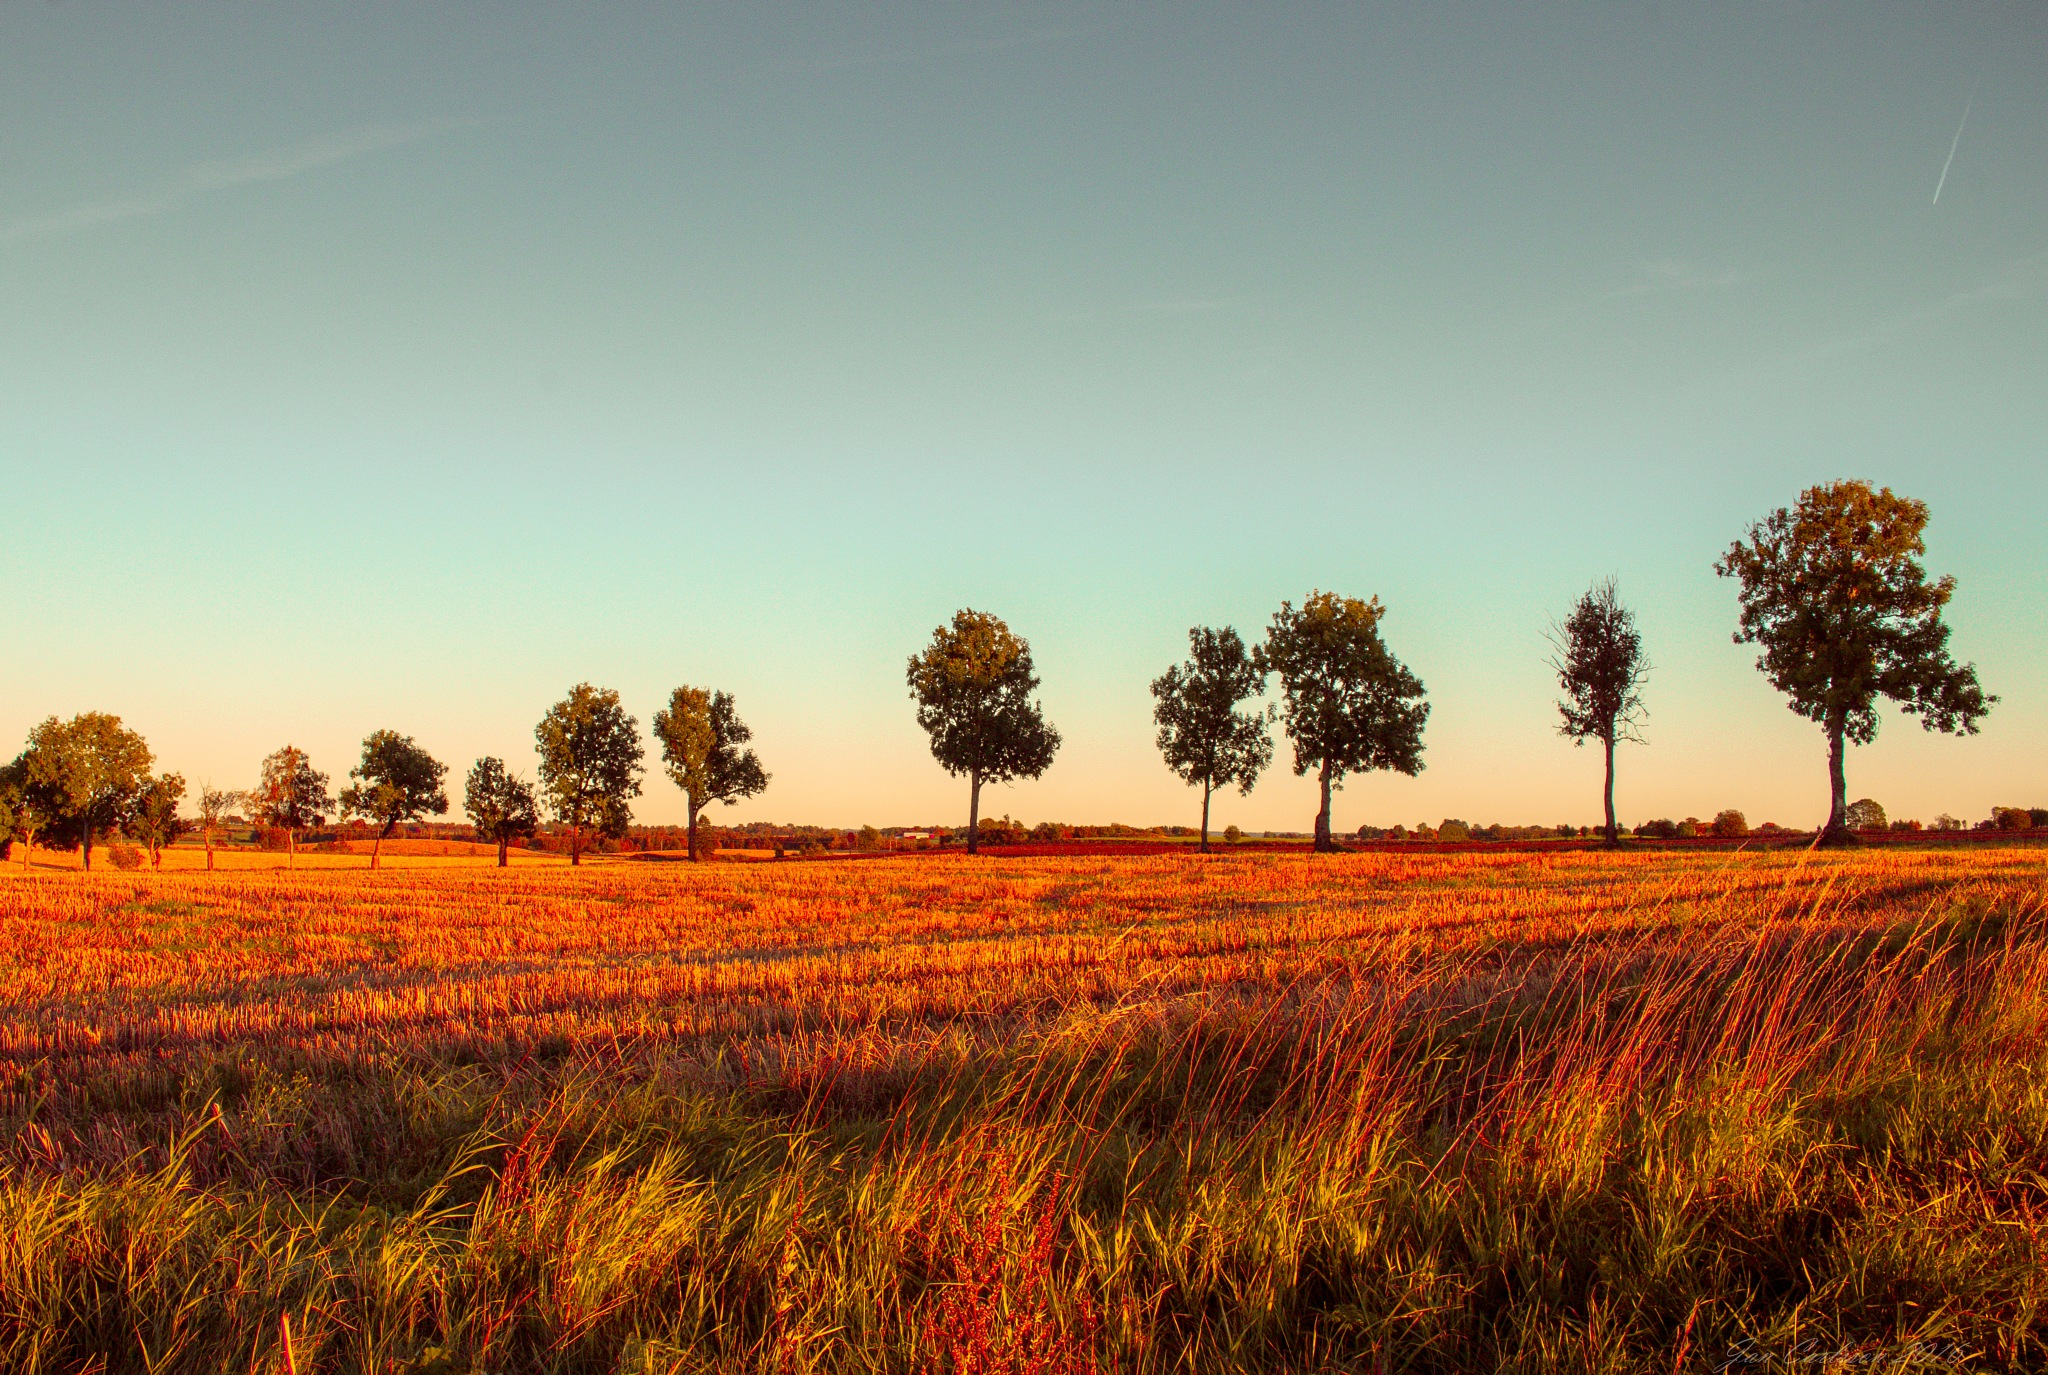 October Sunset 2 by carljan w carlsson